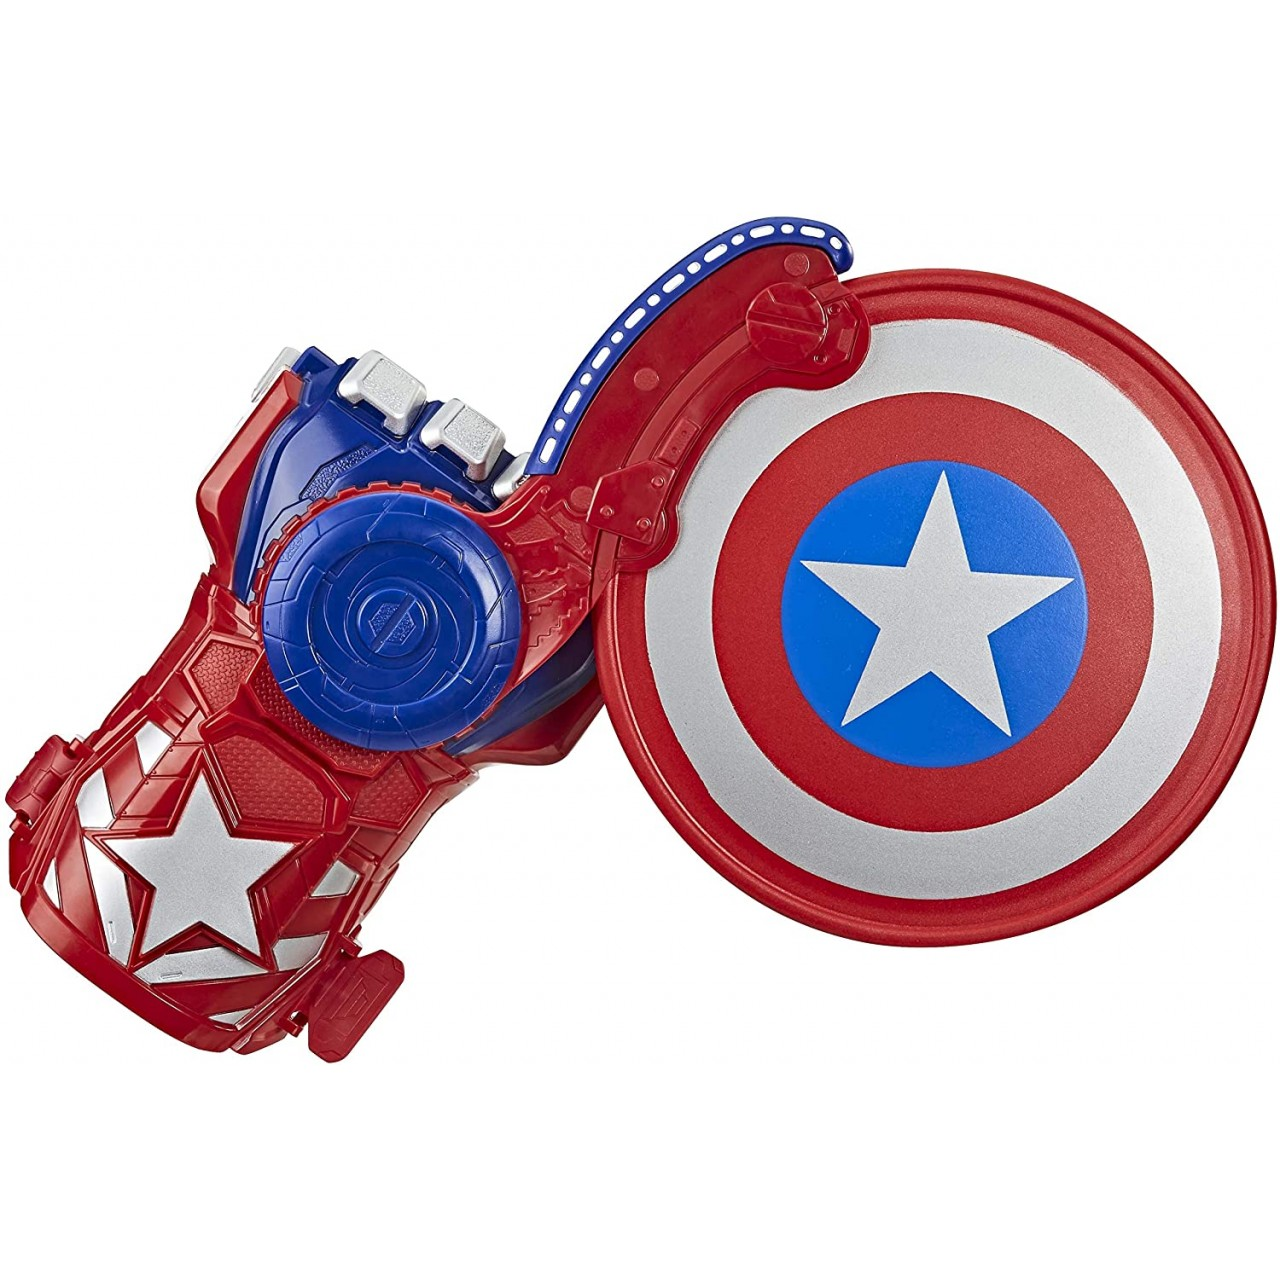 "Бластер-перчатка Капитан Америка ""Мстители: Завершение"" E7375 Nerf от Hasbro"